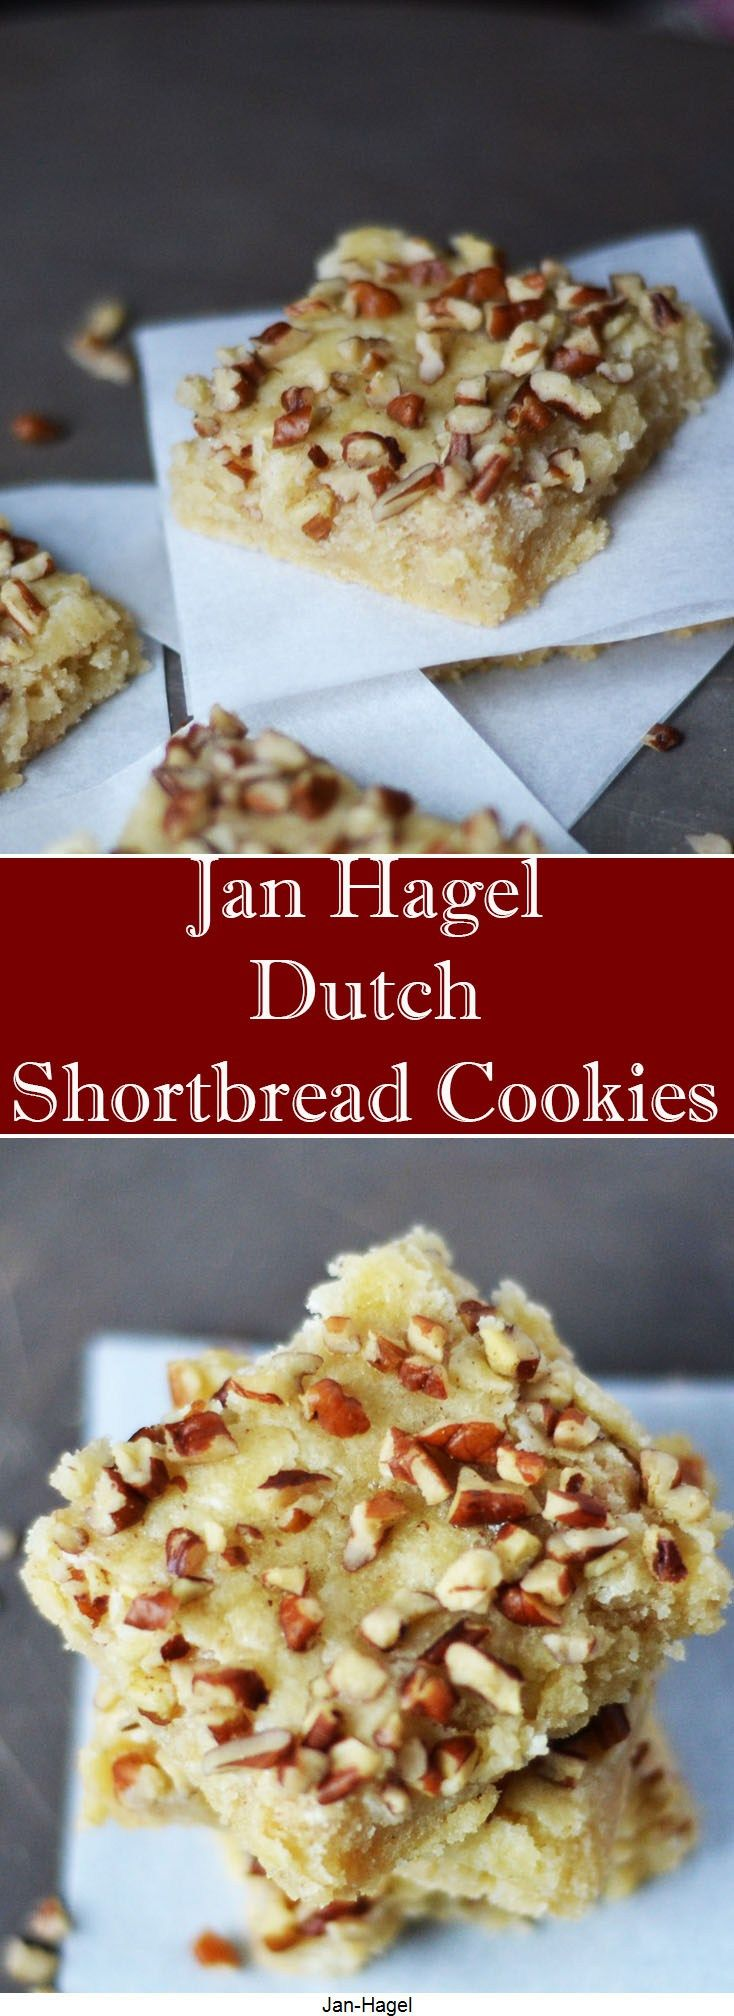 Jan Hagel - Dutch Shortbread Cookies